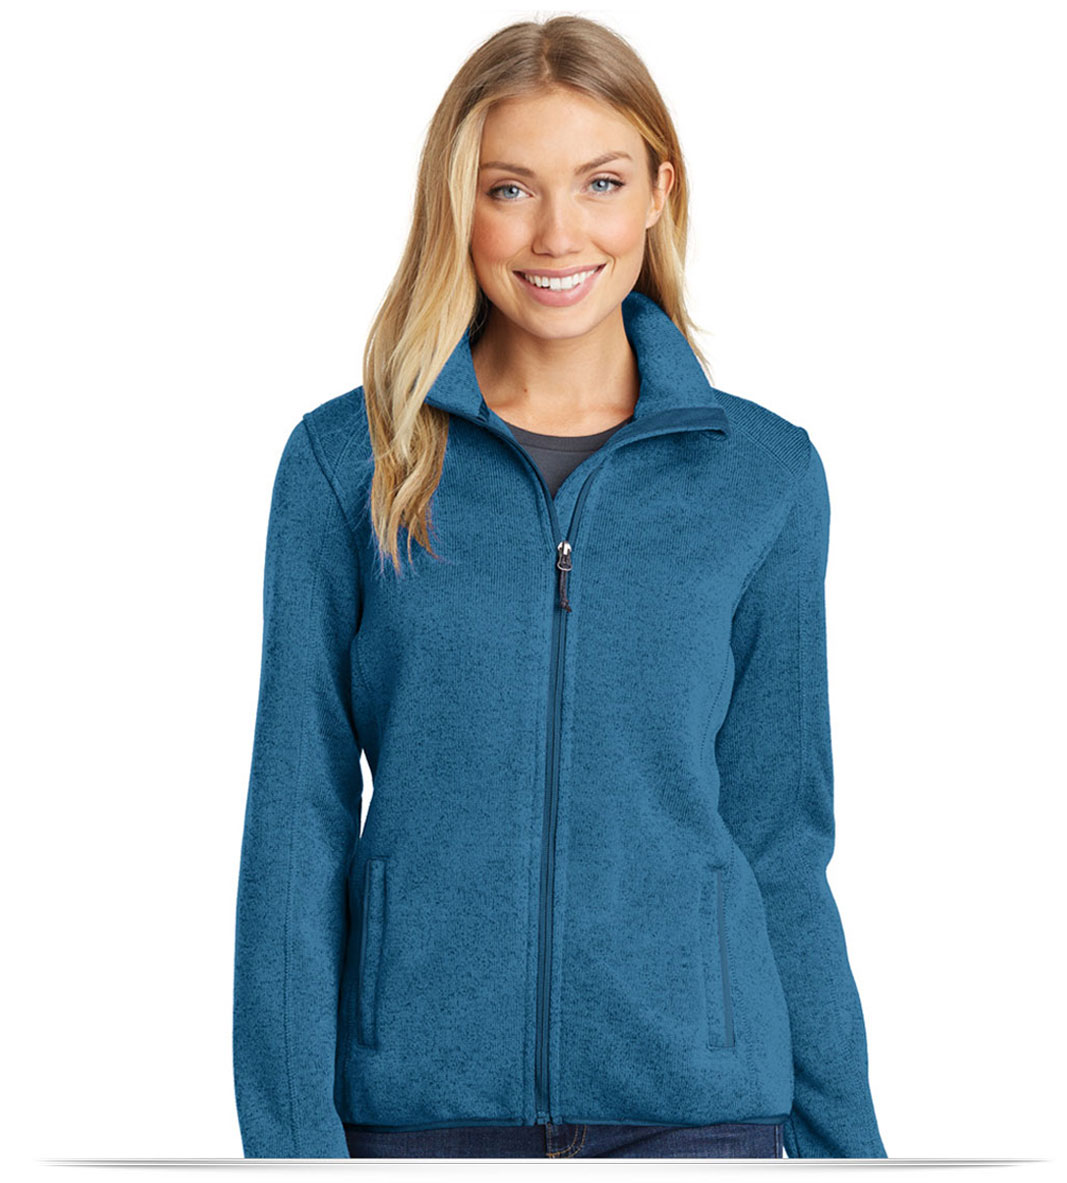 Embroidered Port Authority Ladies Sweater Fleece Jacket